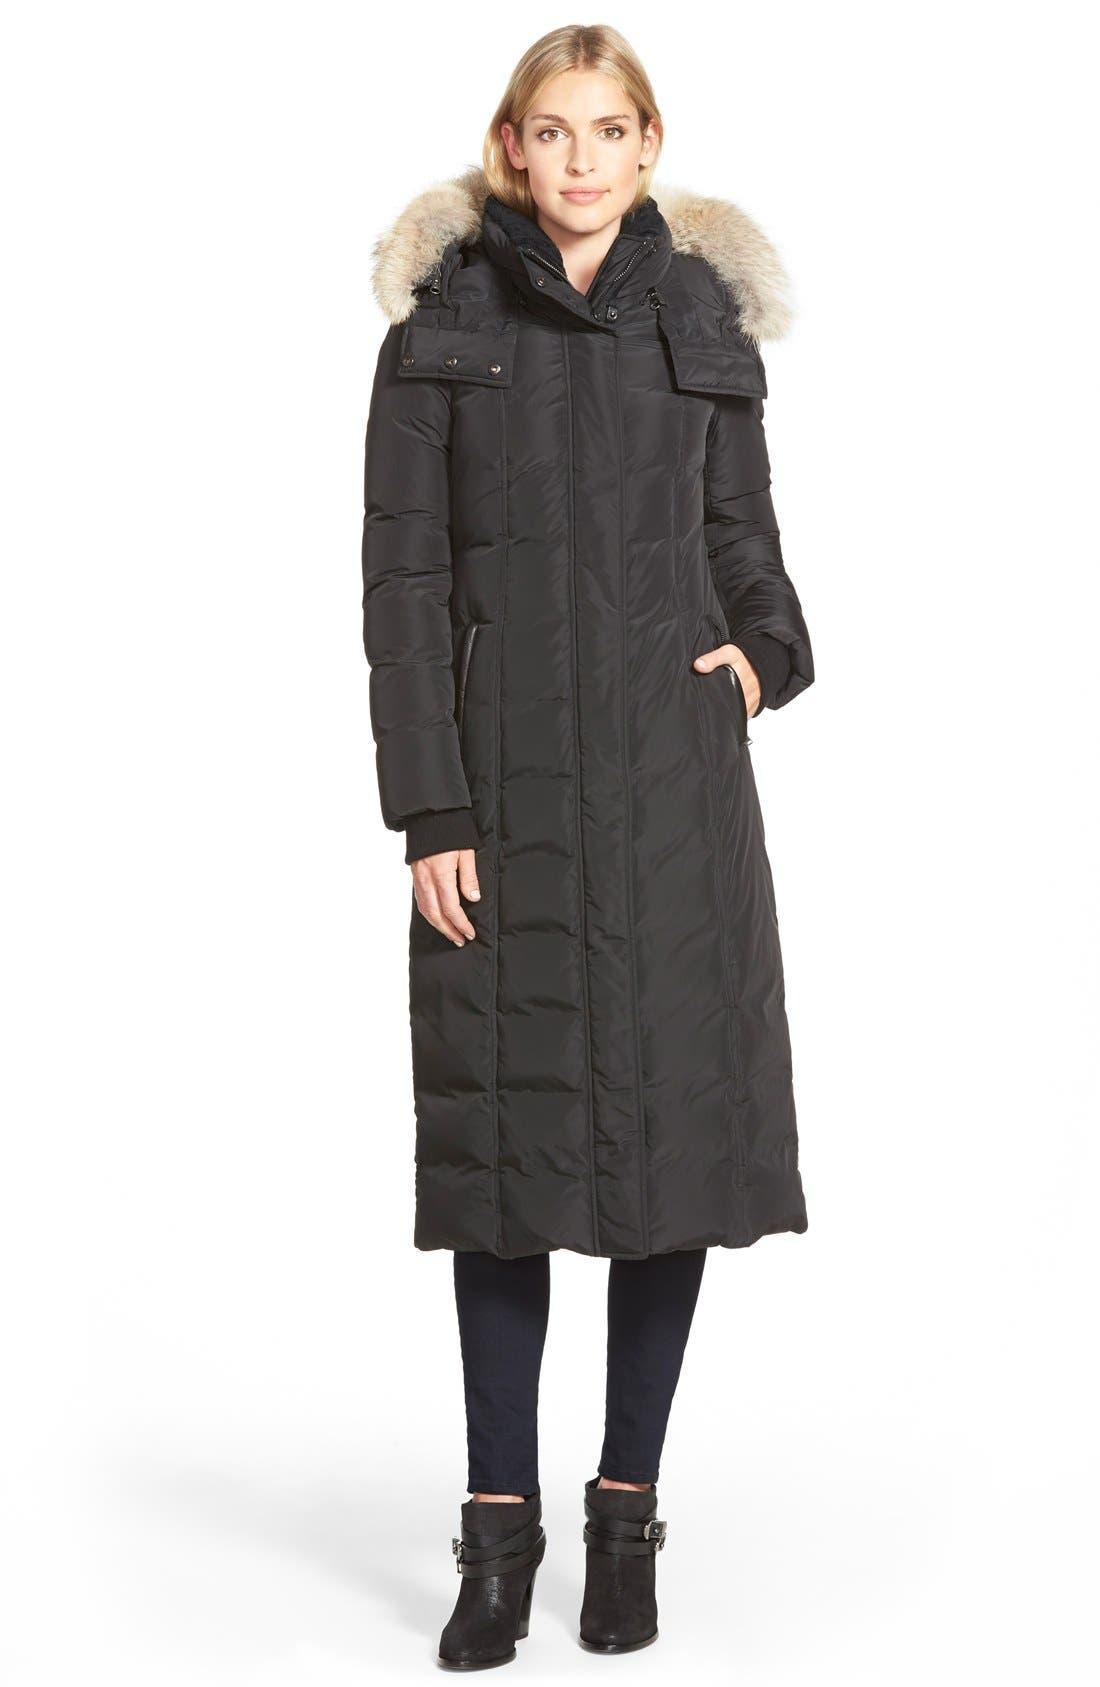 Mackage Long Down Coat With Genuine Coyote Fur & Shearling Trim, Black